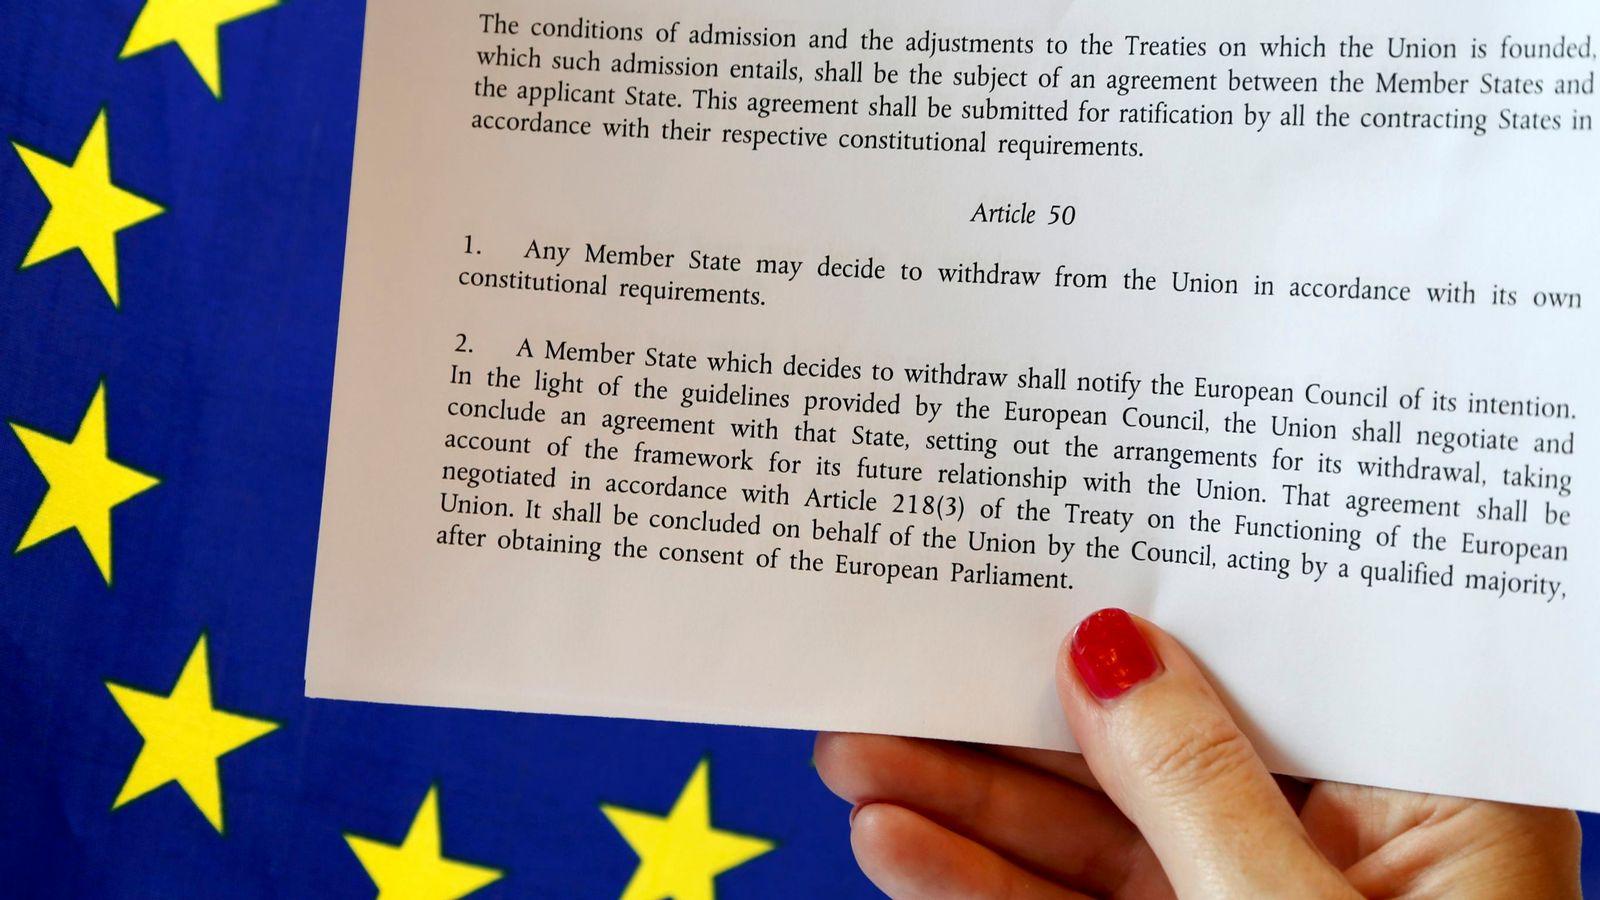 Article 50 of the EU's Lisbon Treaty